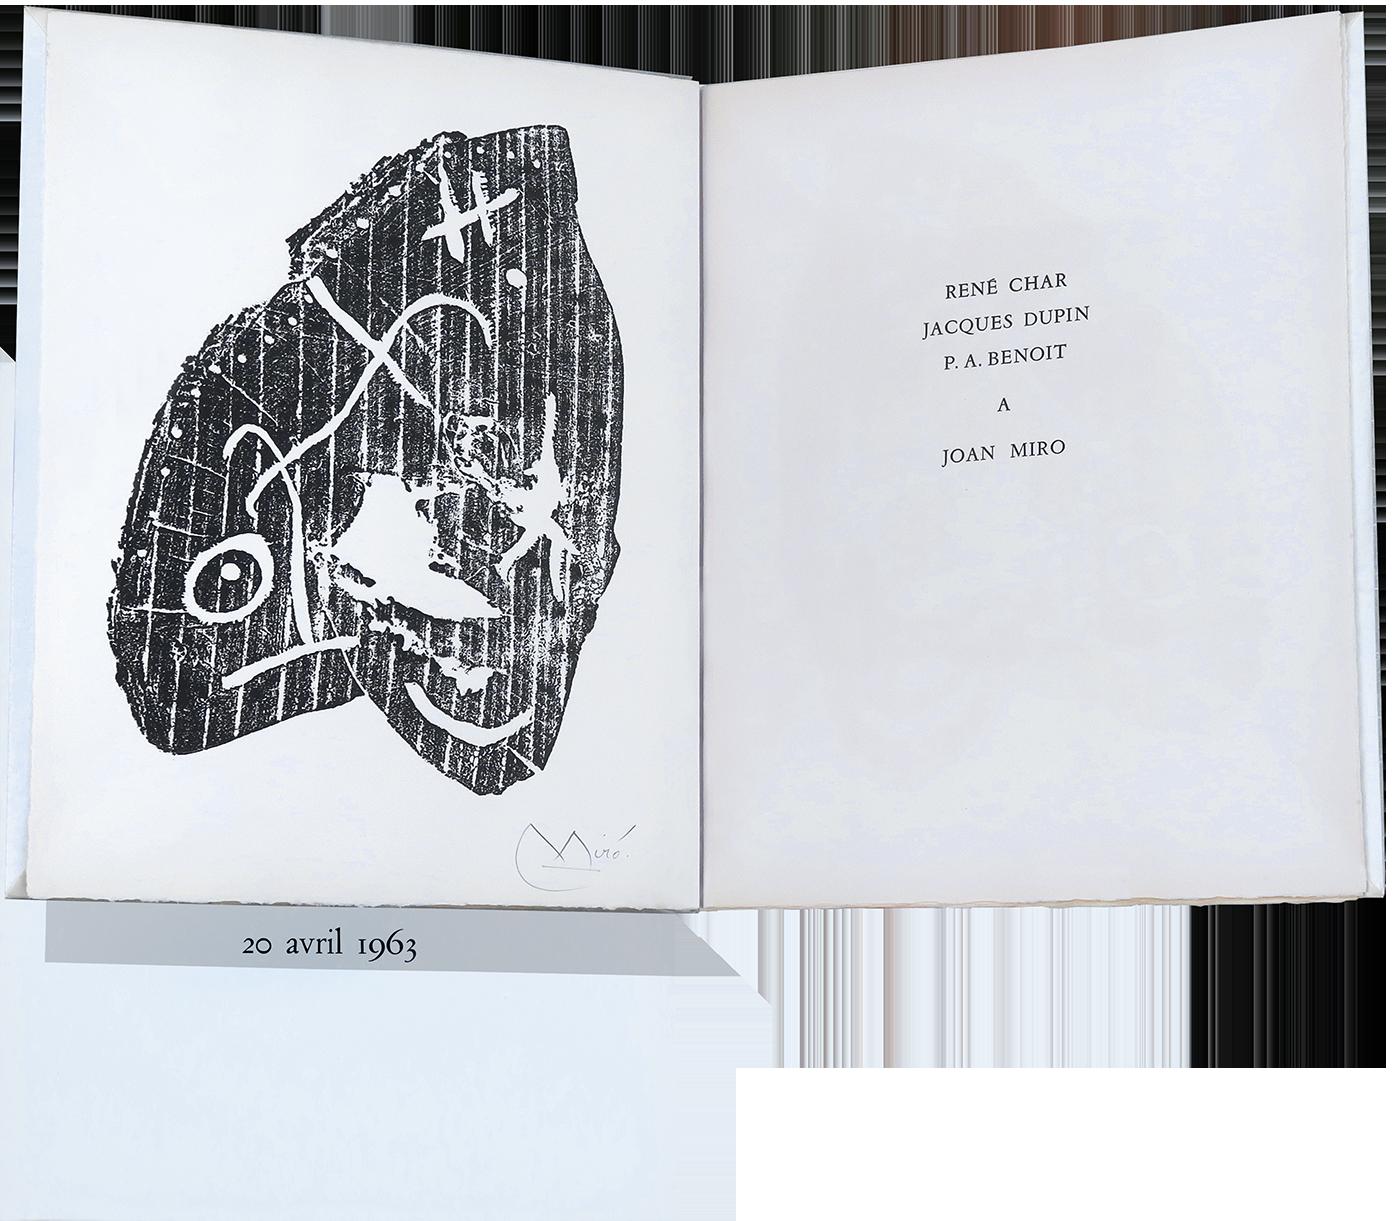 Joan Miro Original Signed Woodcut Book Rene Char Pab Publisher 1963